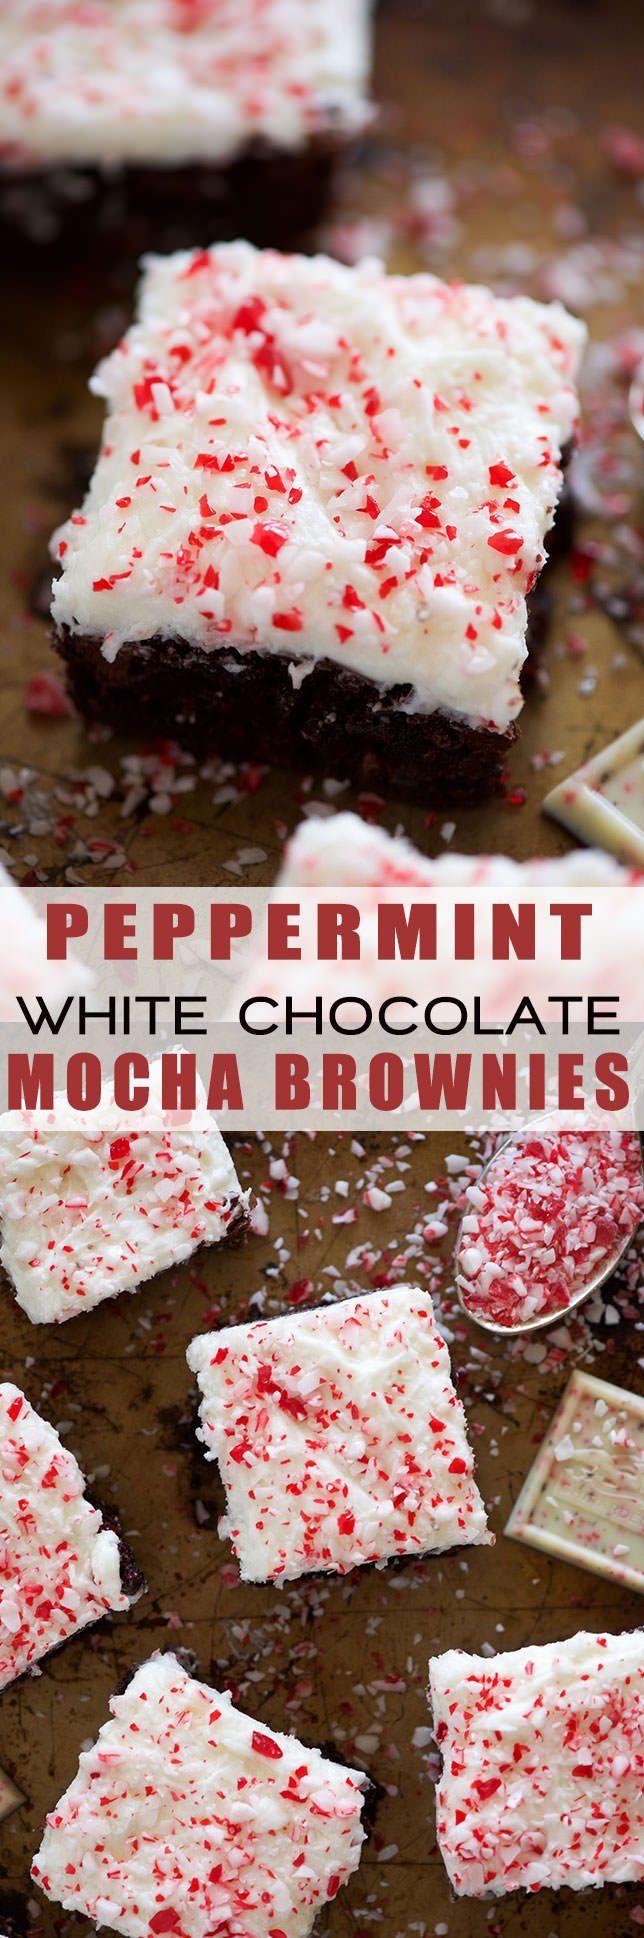 Peppermint White Mocha Brownies Recipe | Fudgy, Easy, Desserts, Gluten Free, Healthy, Coffee